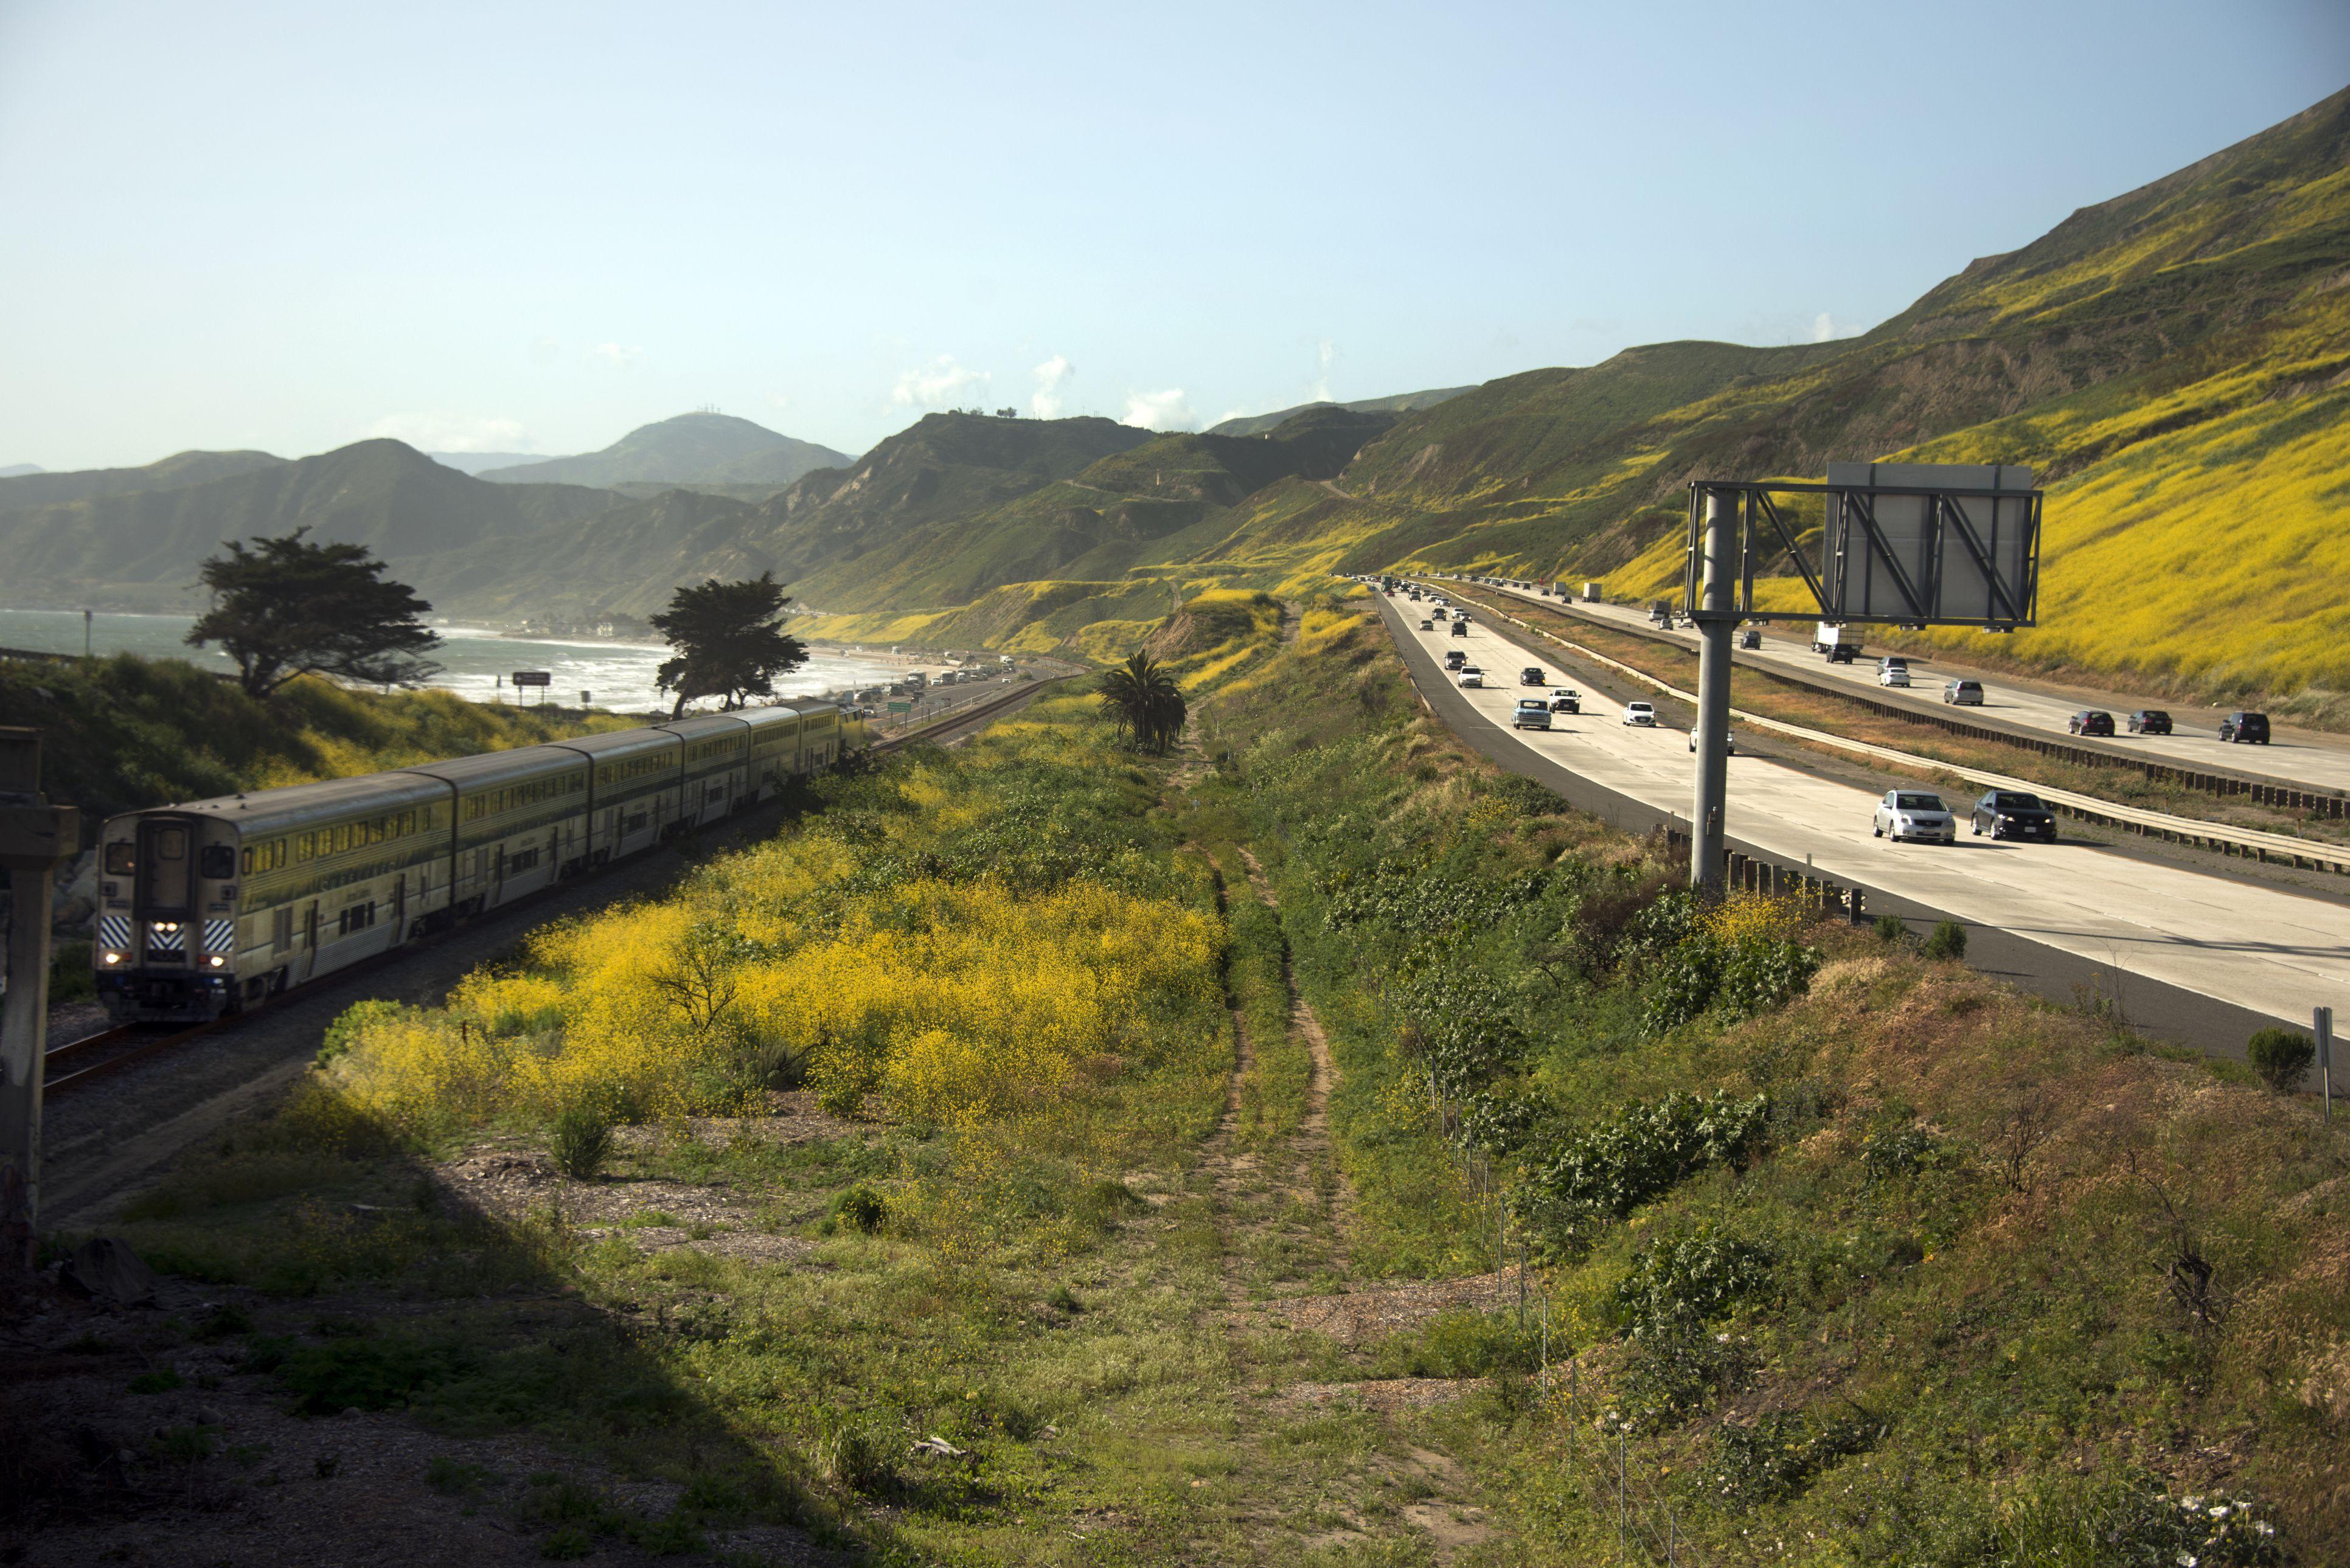 California highway 101 la to san francisco road trip for Coast to coast motors north freeway